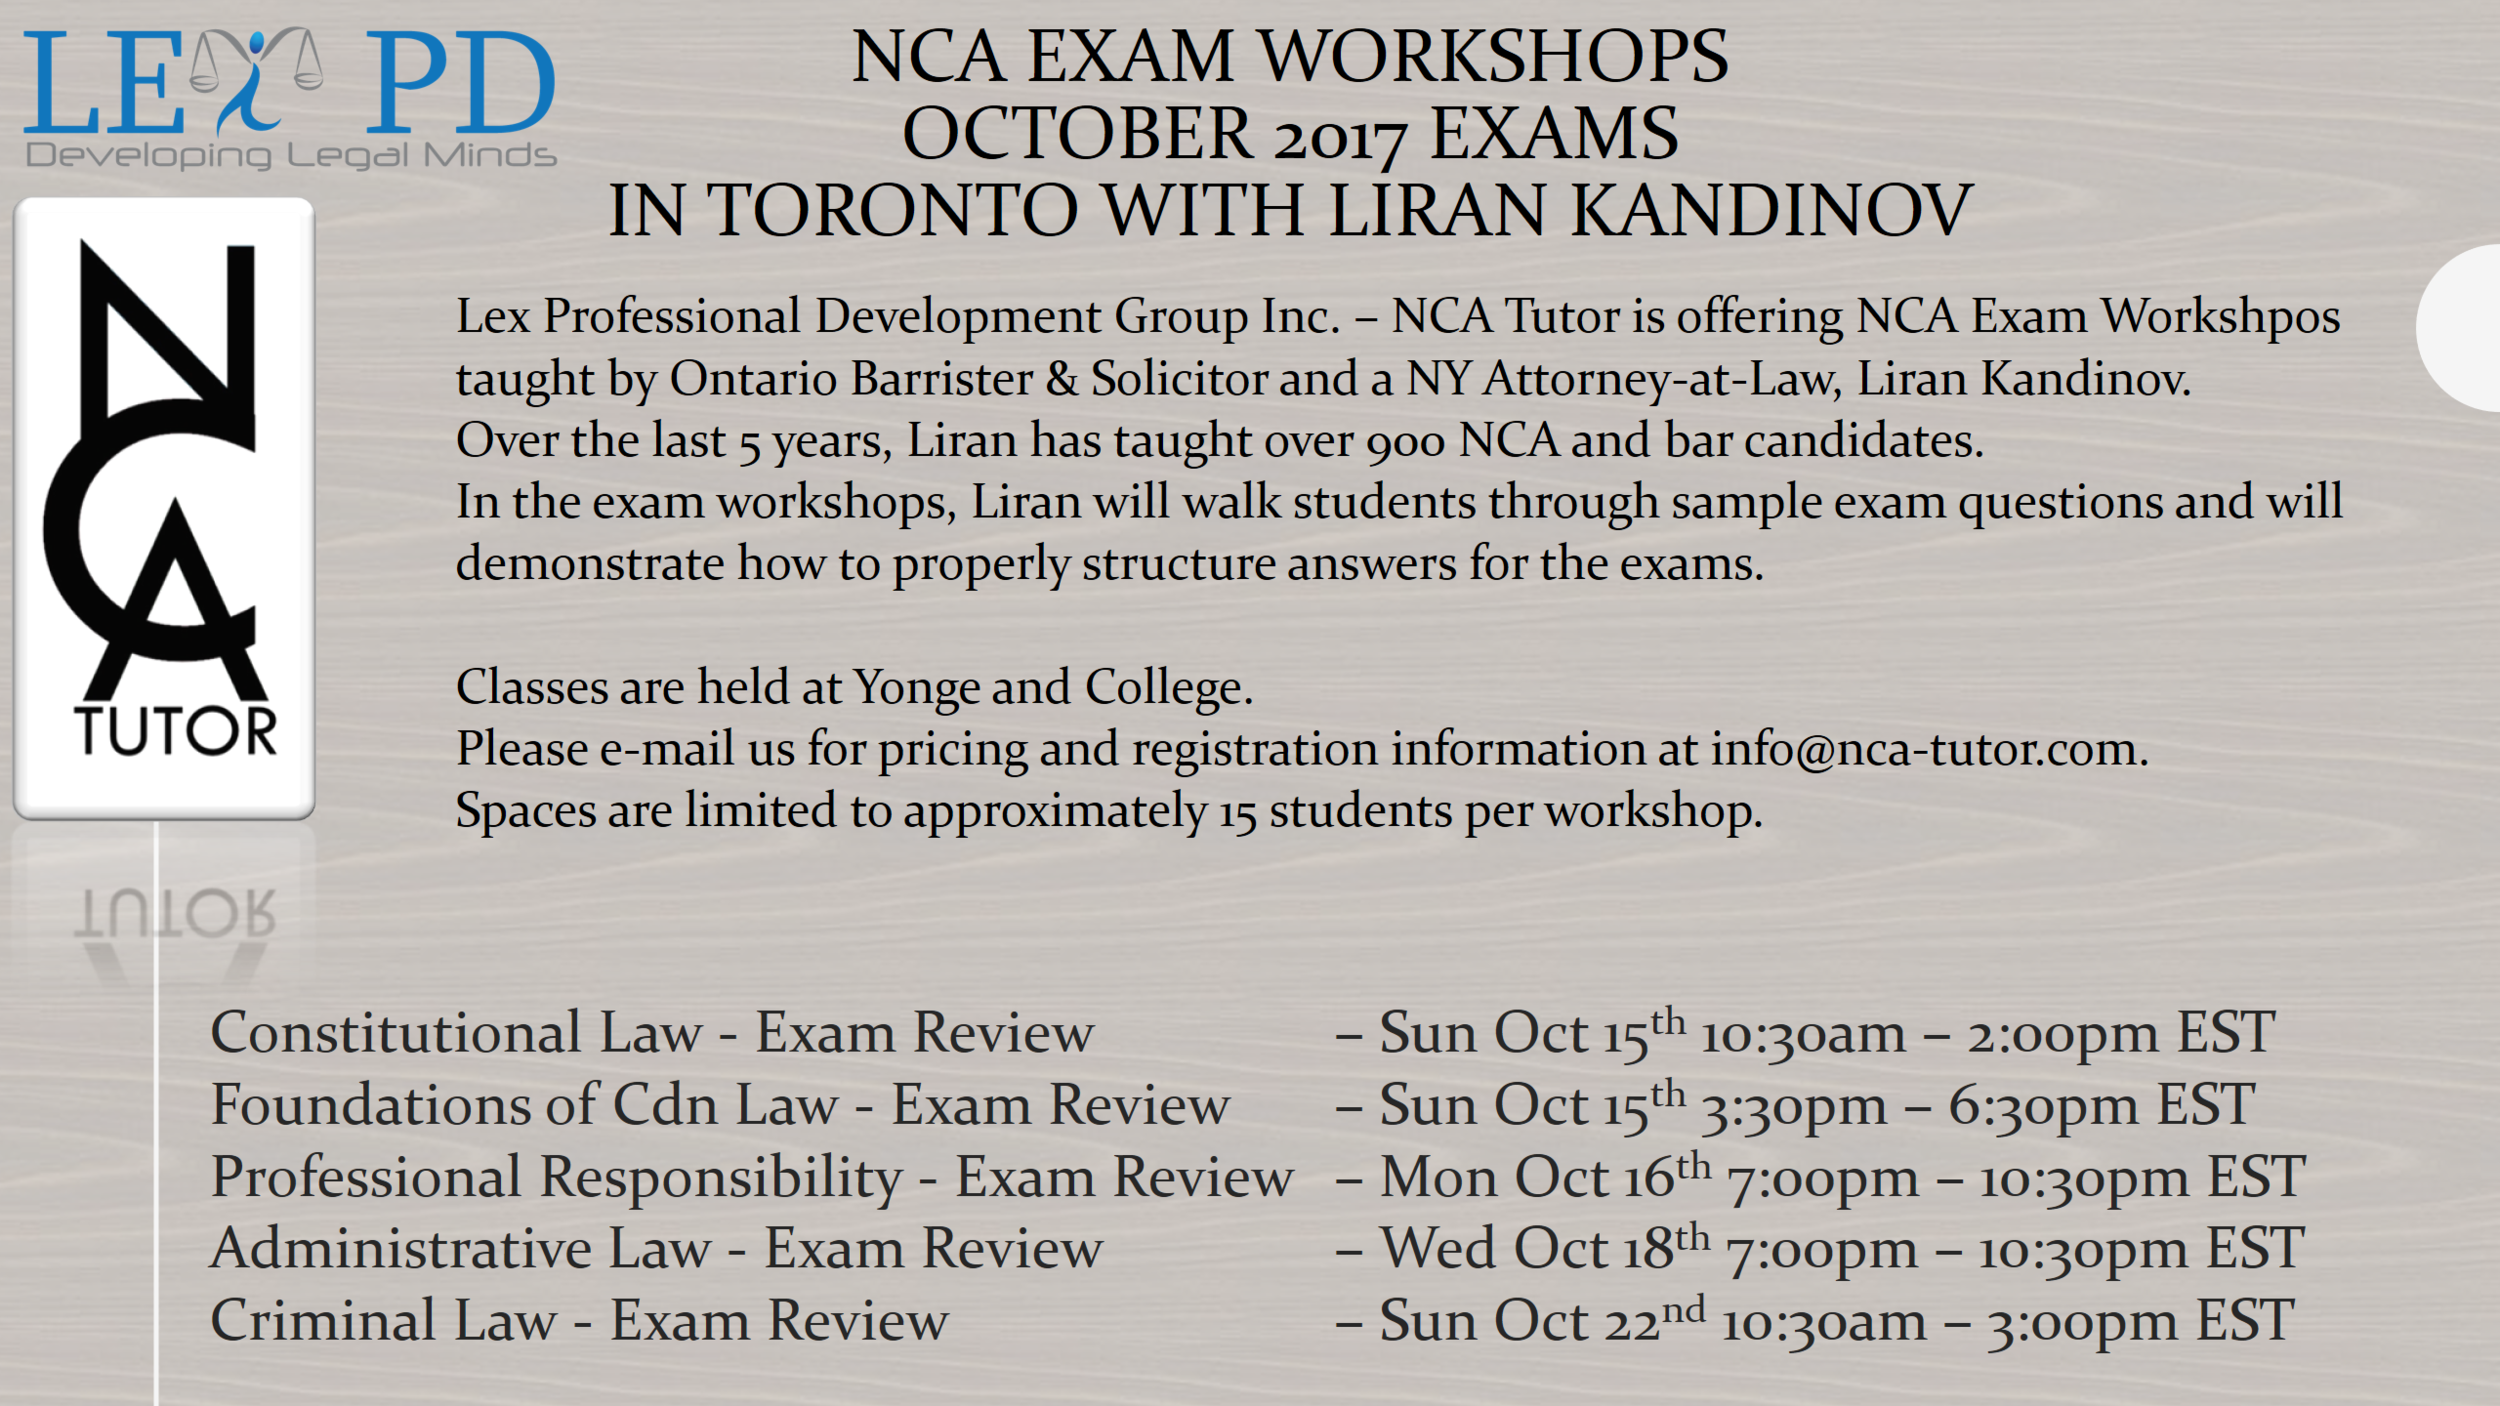 Exam Workshops for October 2017 NCA Exams